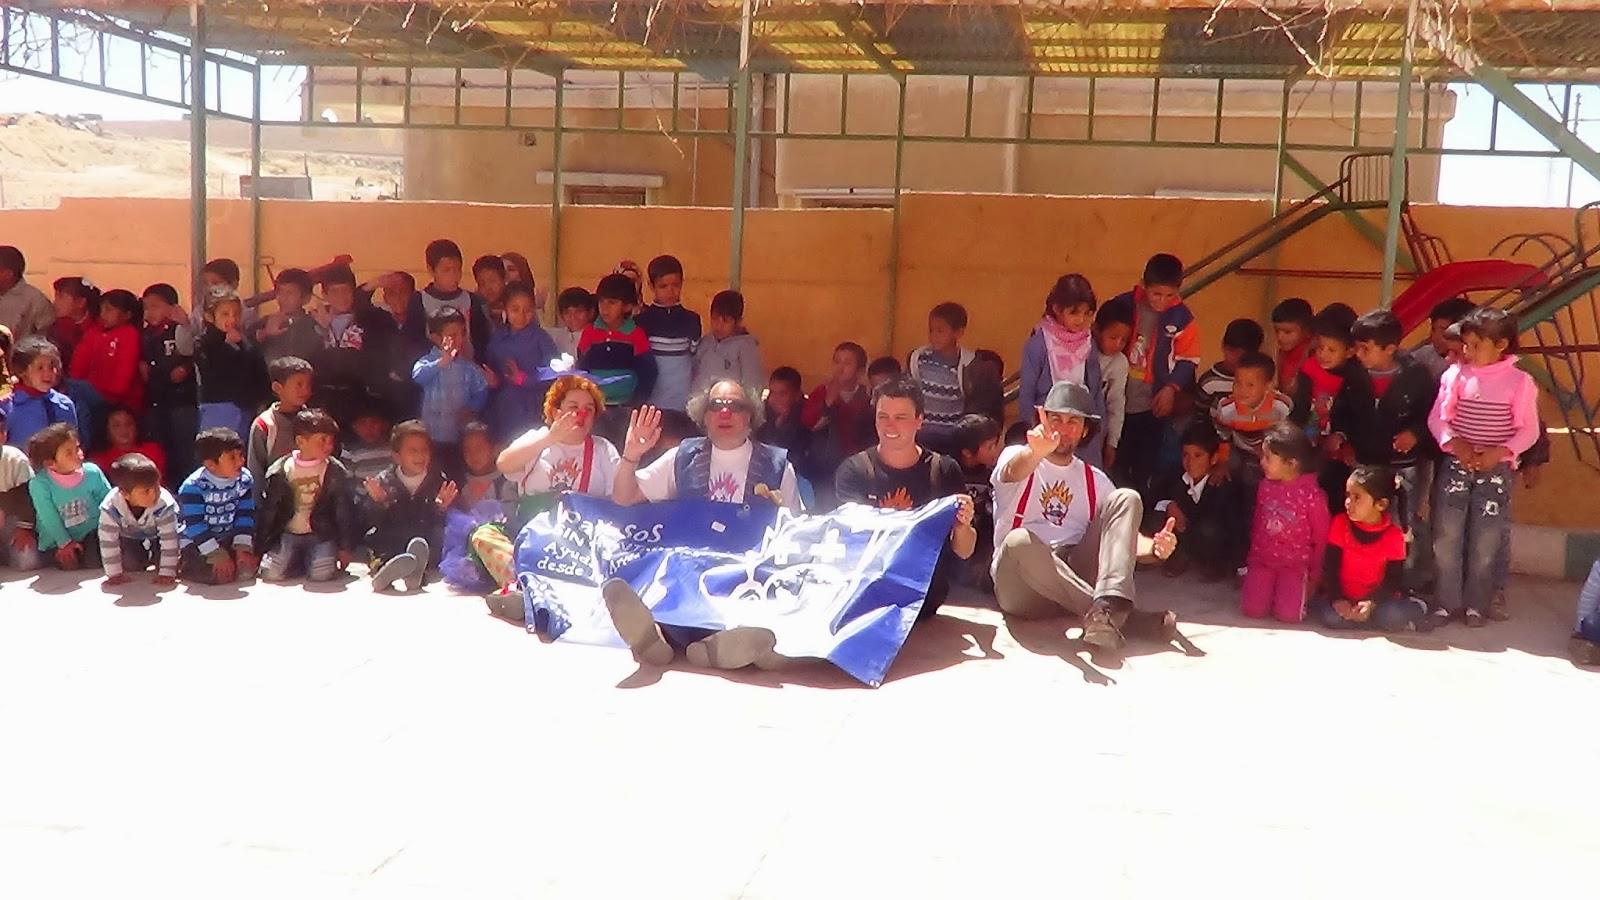 Moi Jordana amb Pallassos sense fronteres a Jordania 2013